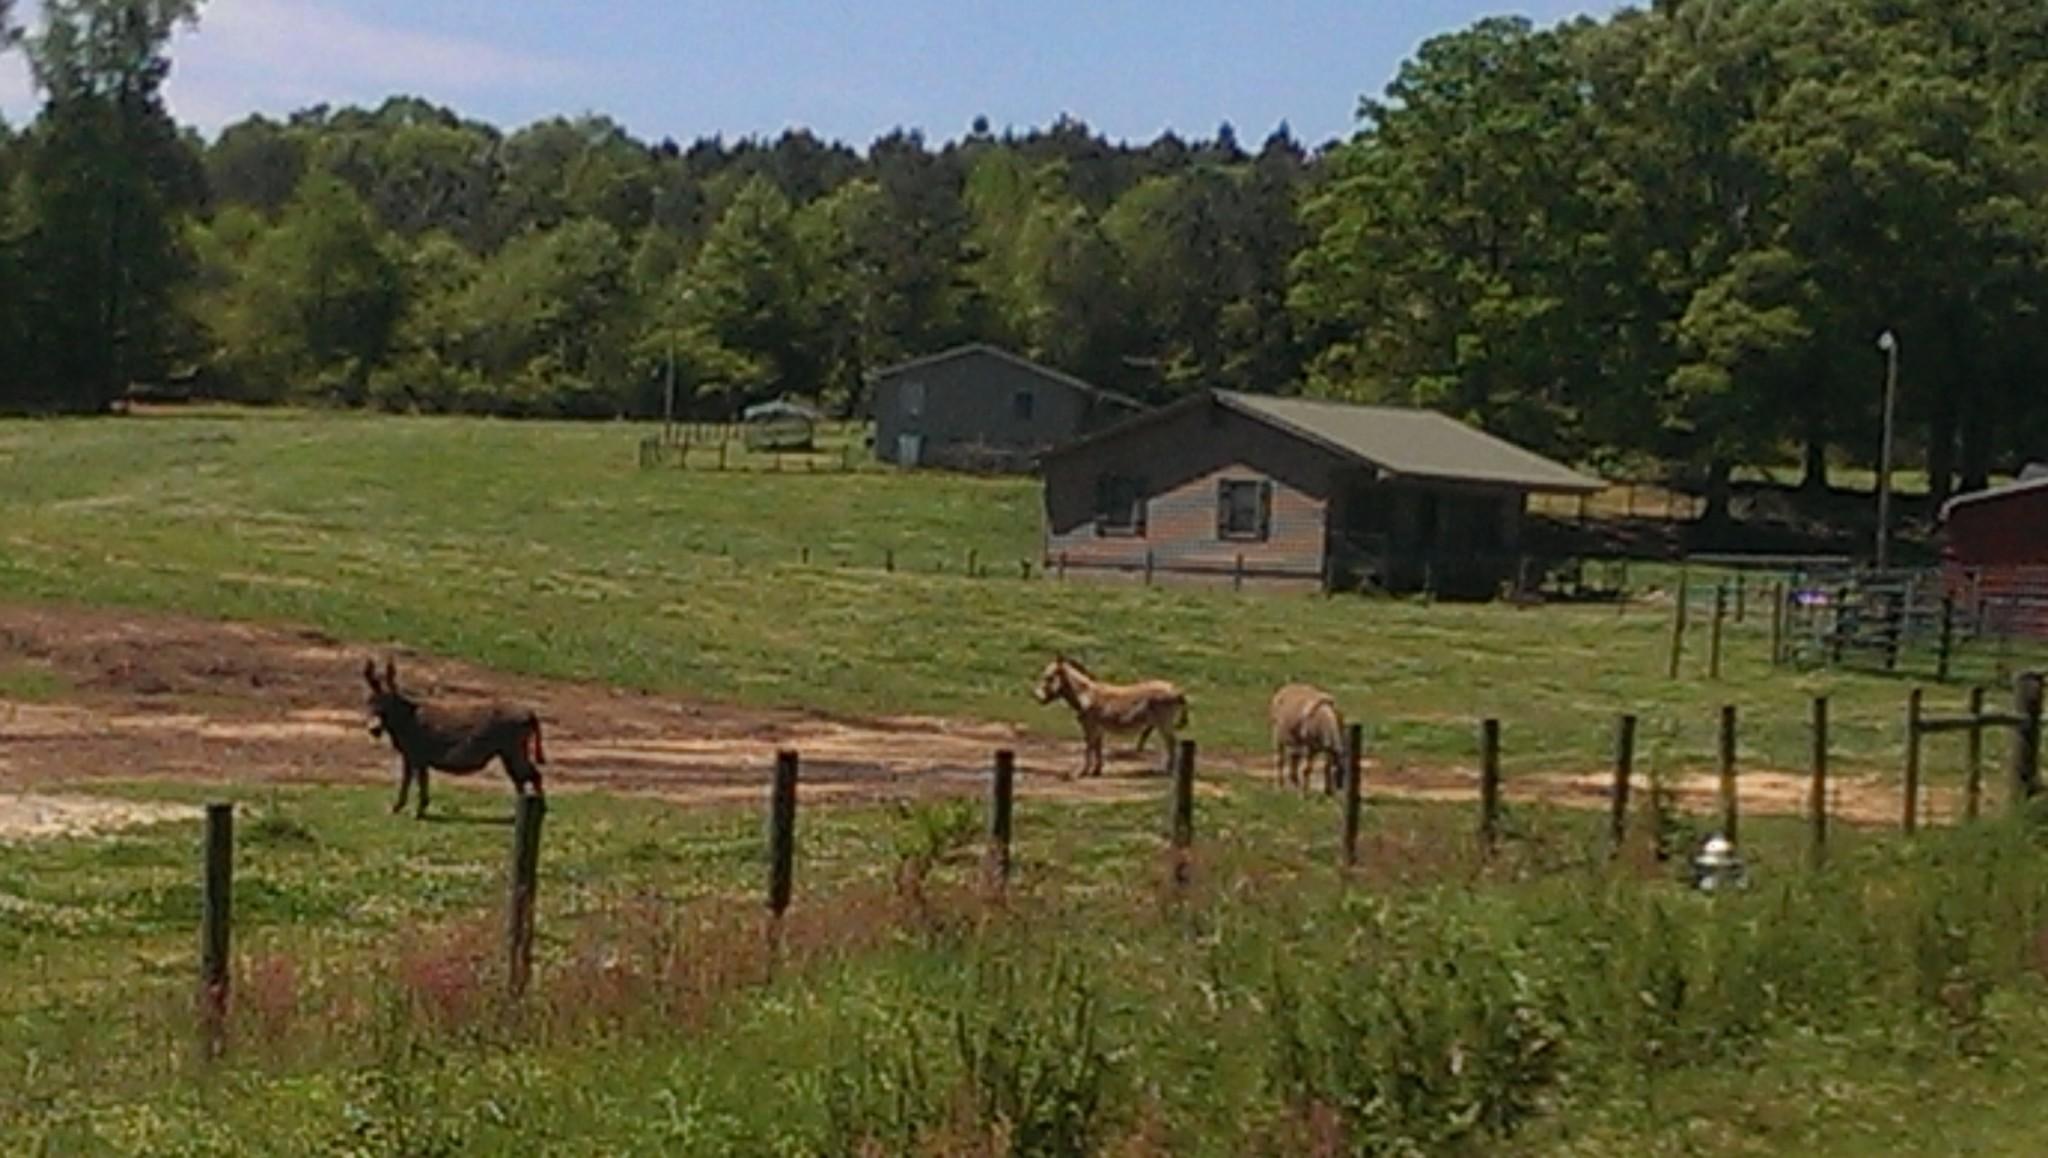 Livestock at the Googled Warrior Dash Location